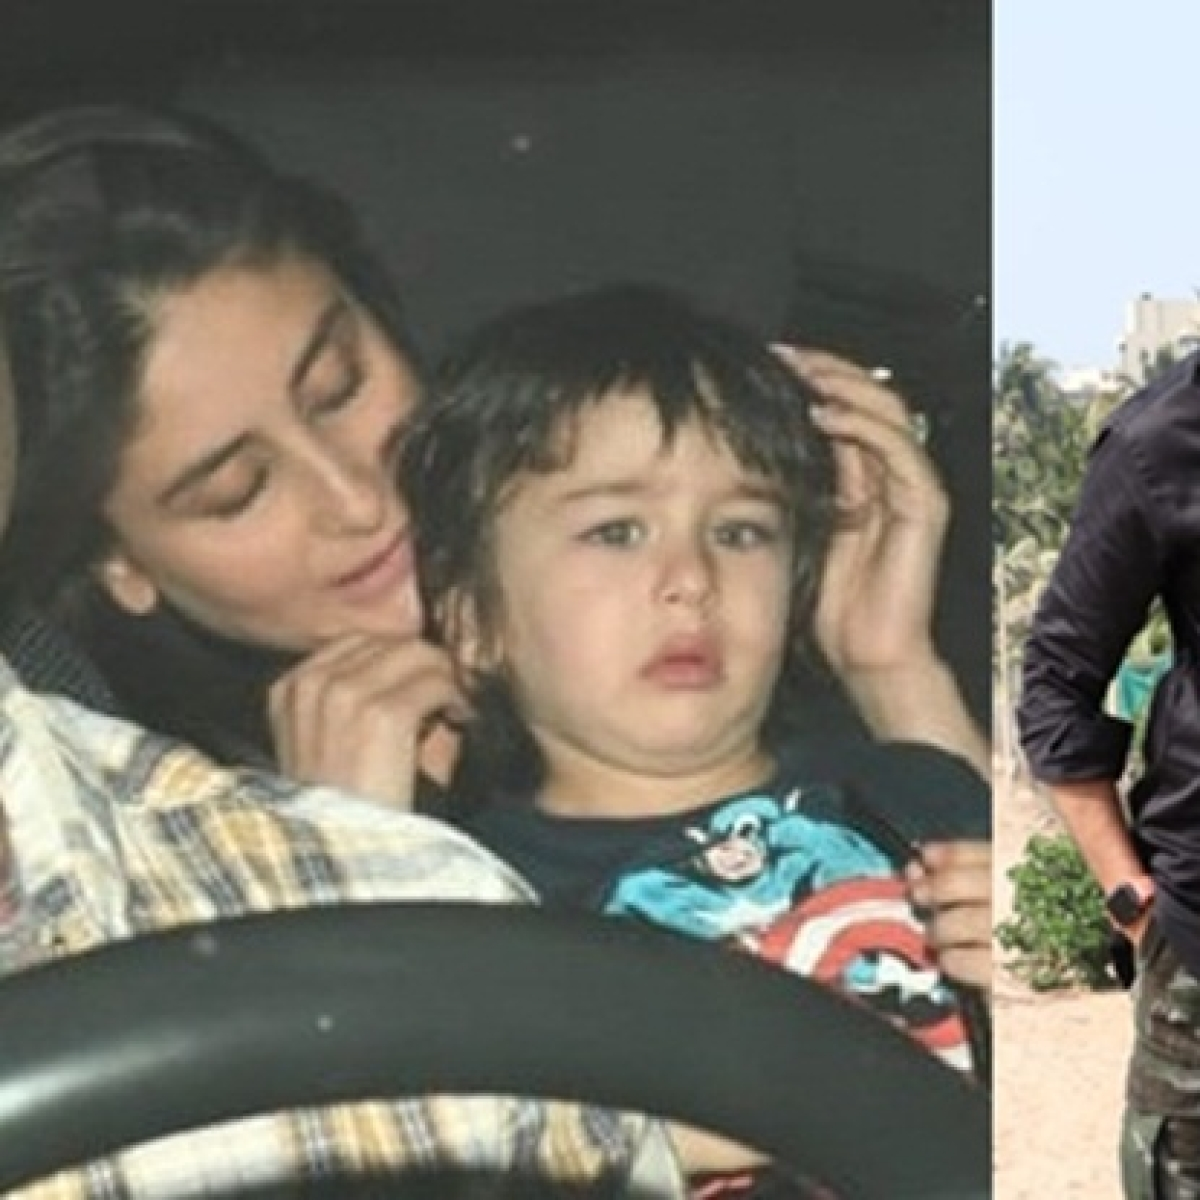 In pics: Kareena Kapoor, Taimur Ali Khan, Tiger Shroff and others spotted around Mumbai